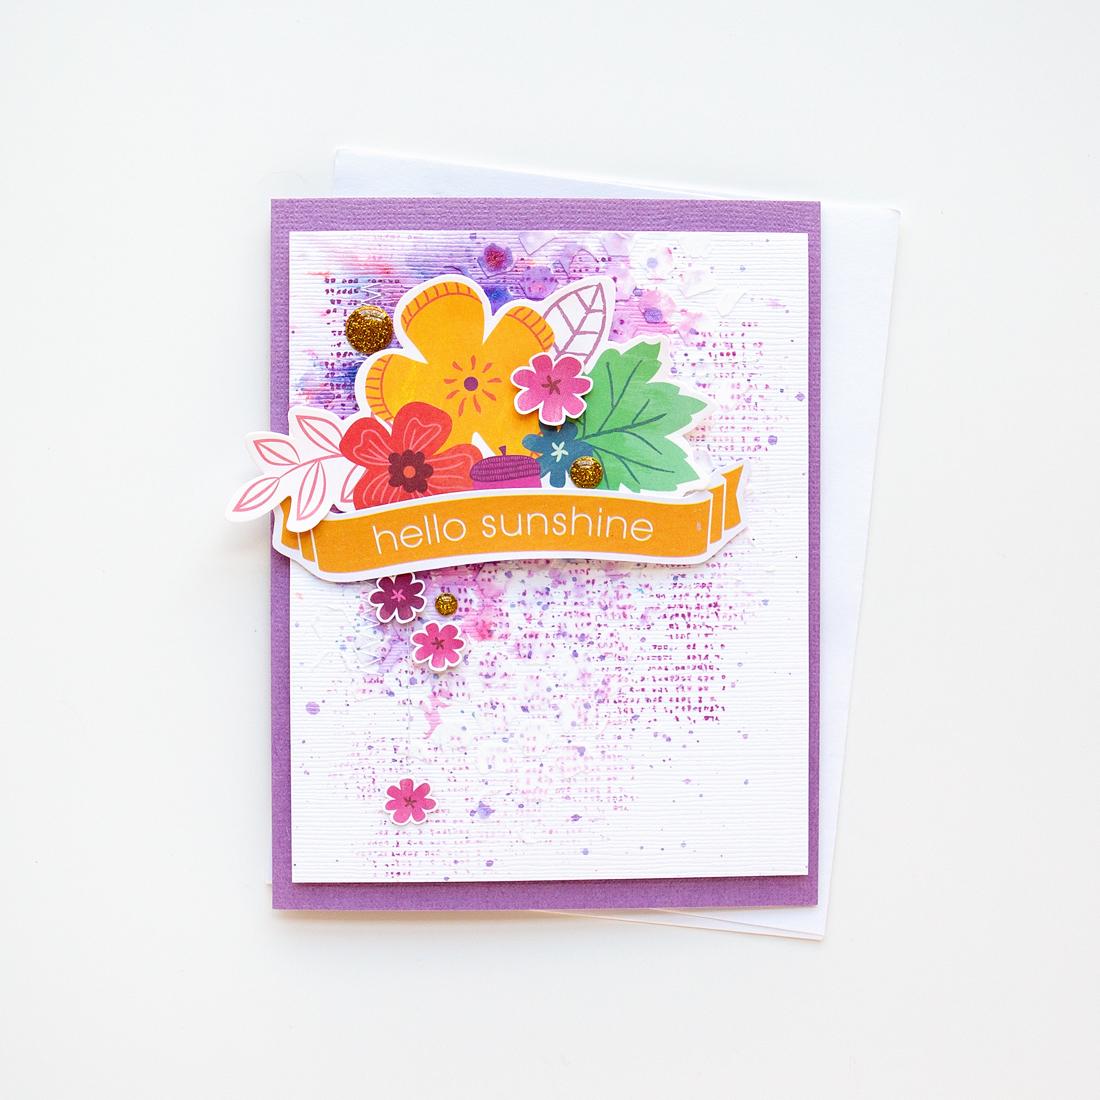 ahsang HKC 3cards Sept14 3